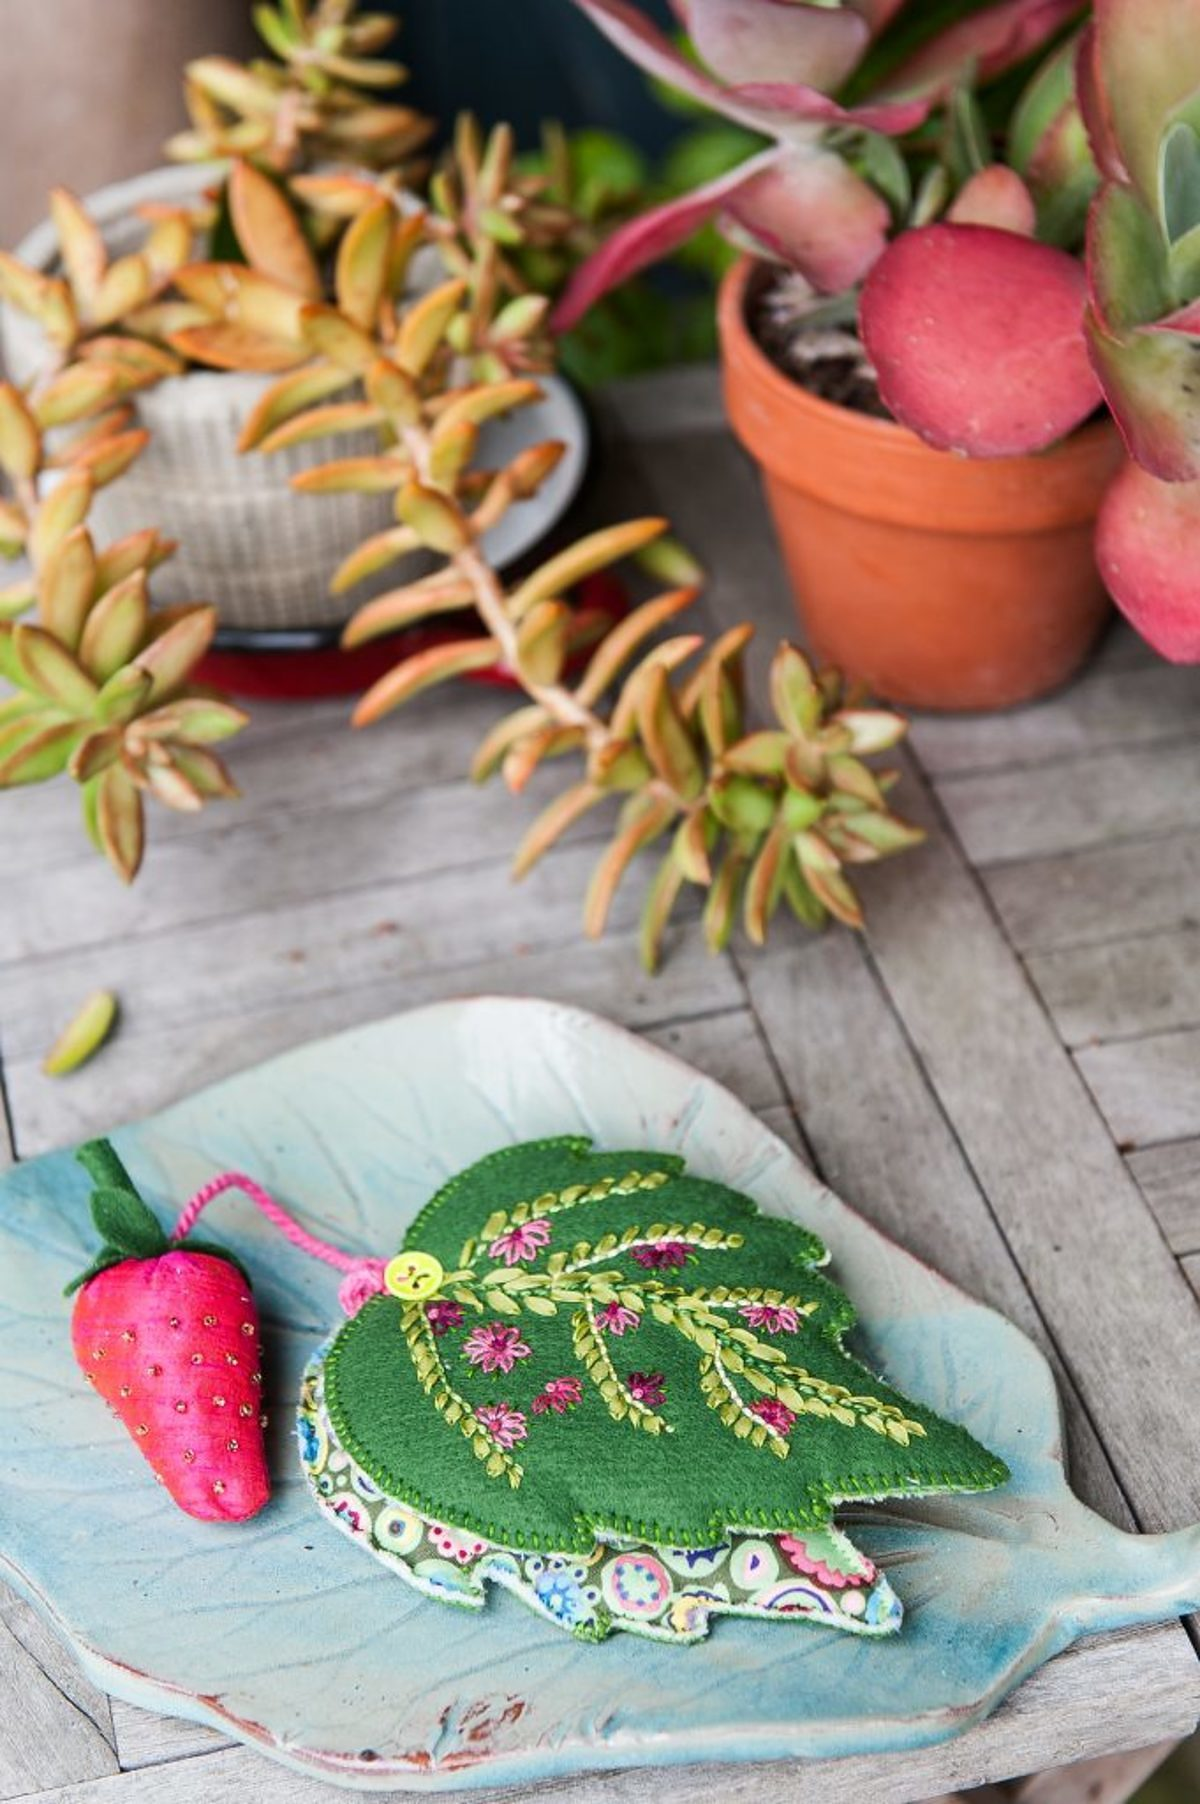 Pique-épingles Emeraude - © photo et stylisme : Marine Delmer